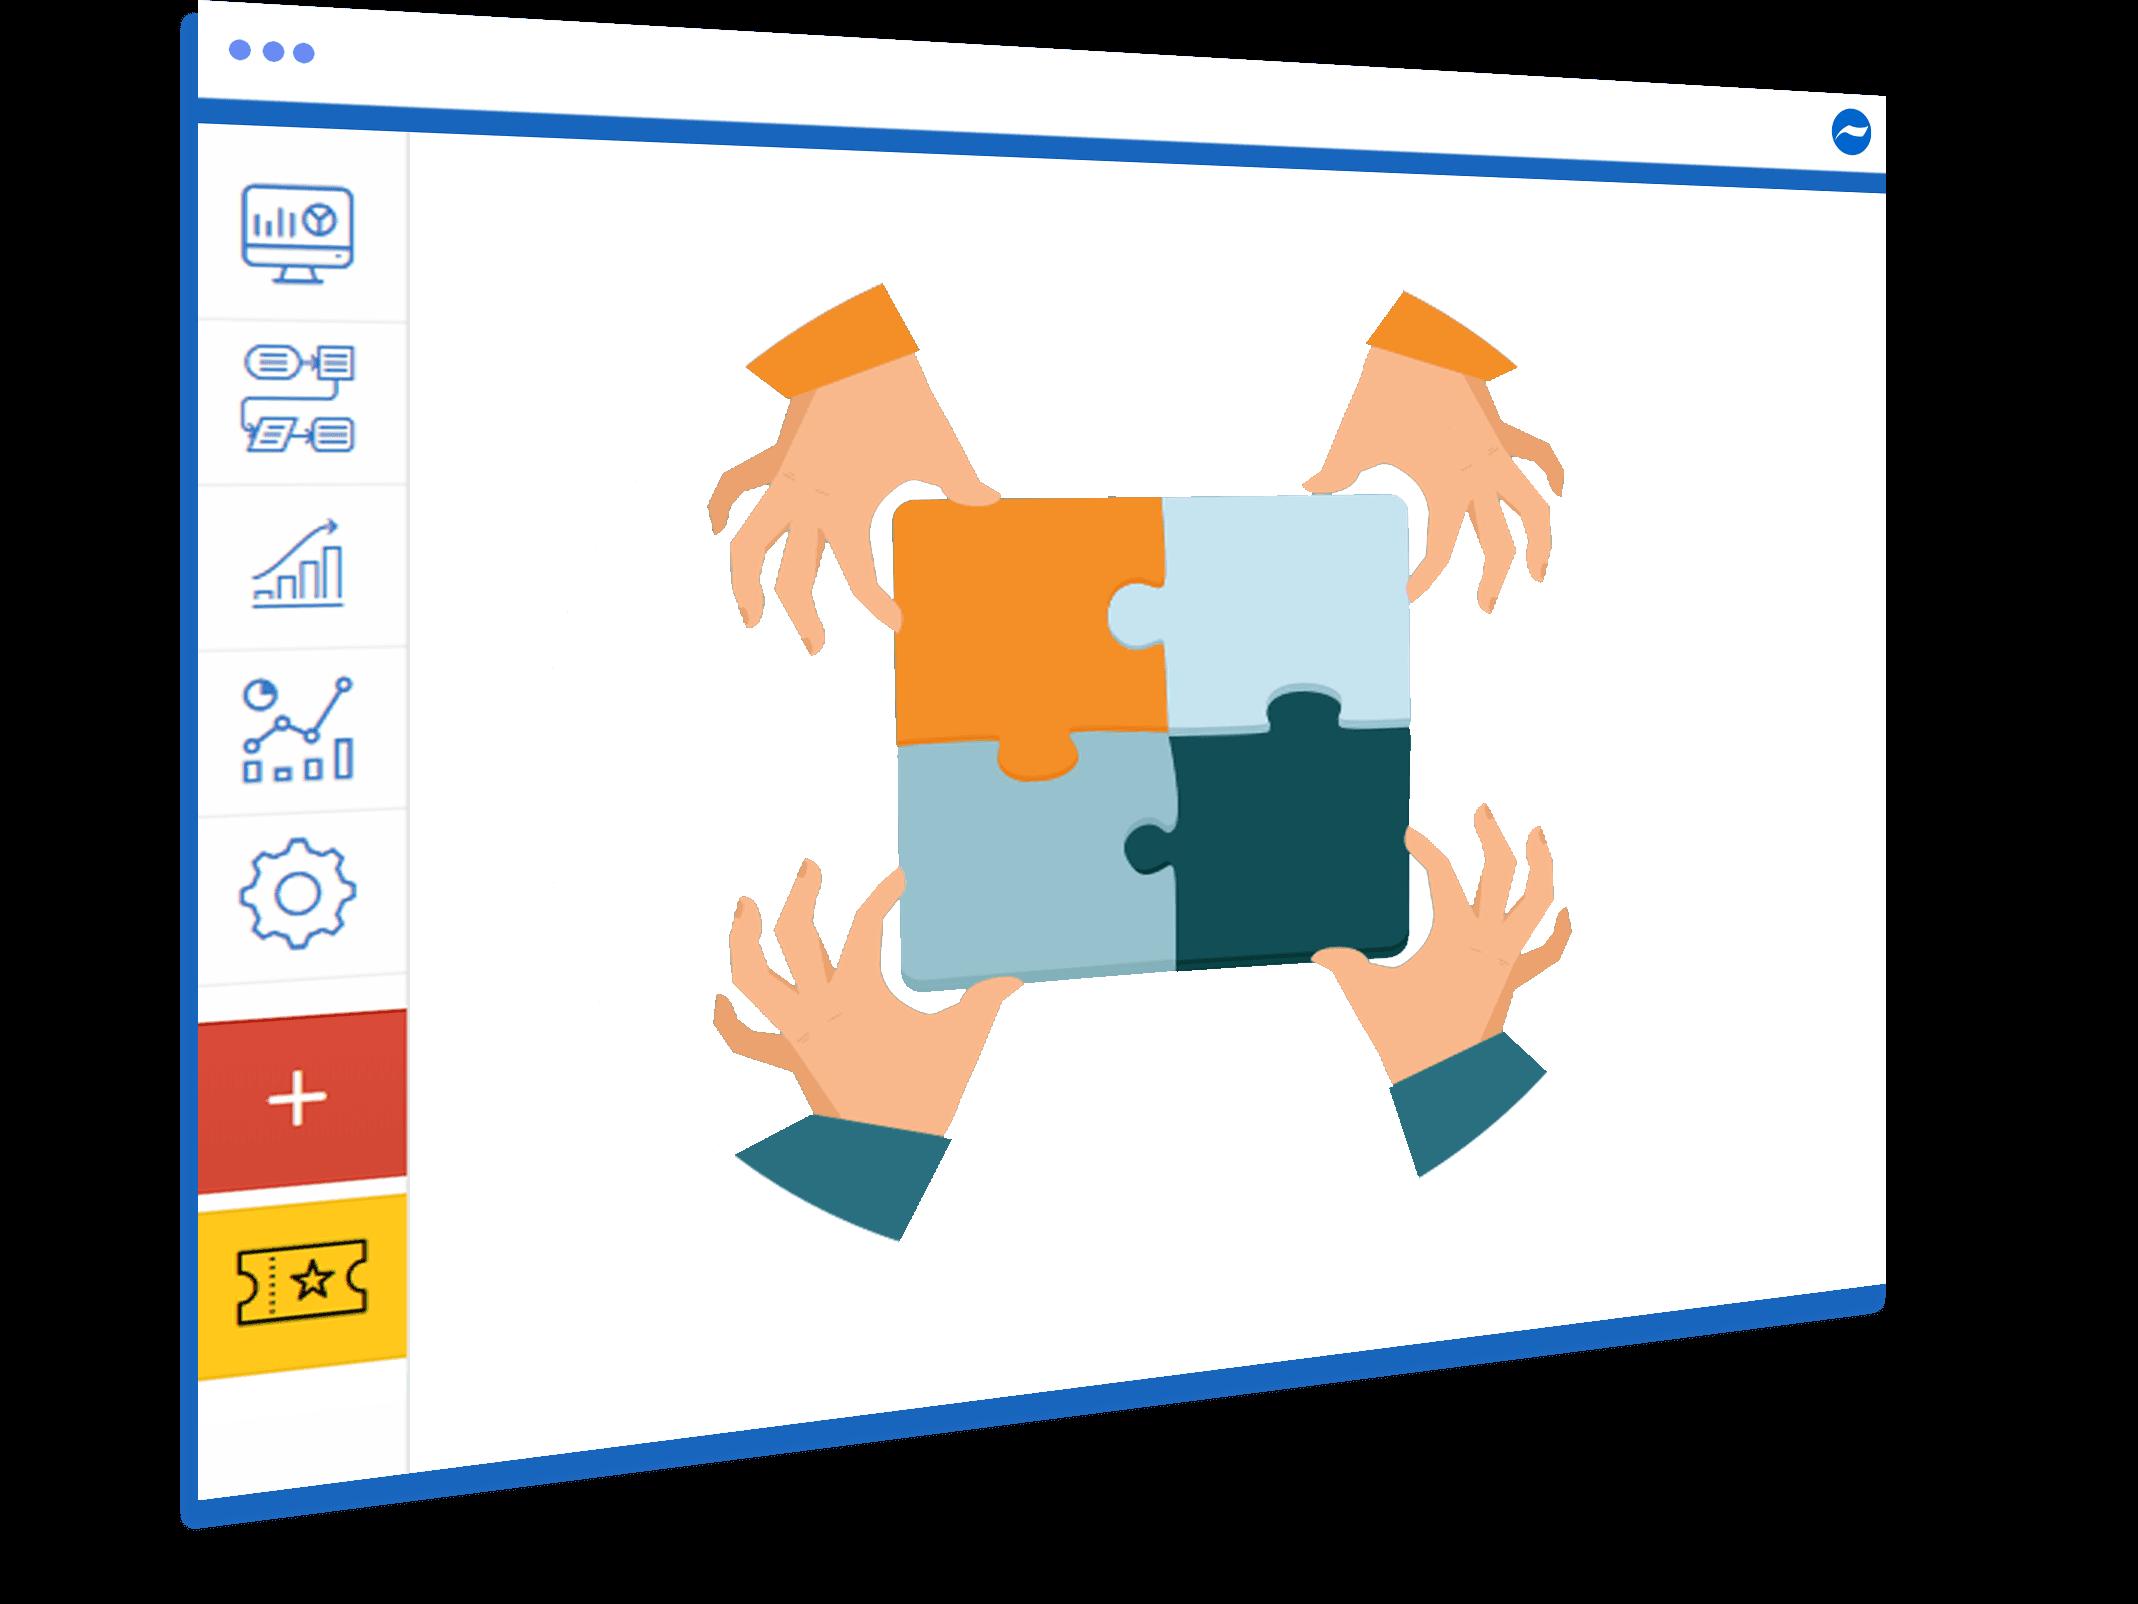 Processmaker alternative feature social collaboration Cflow